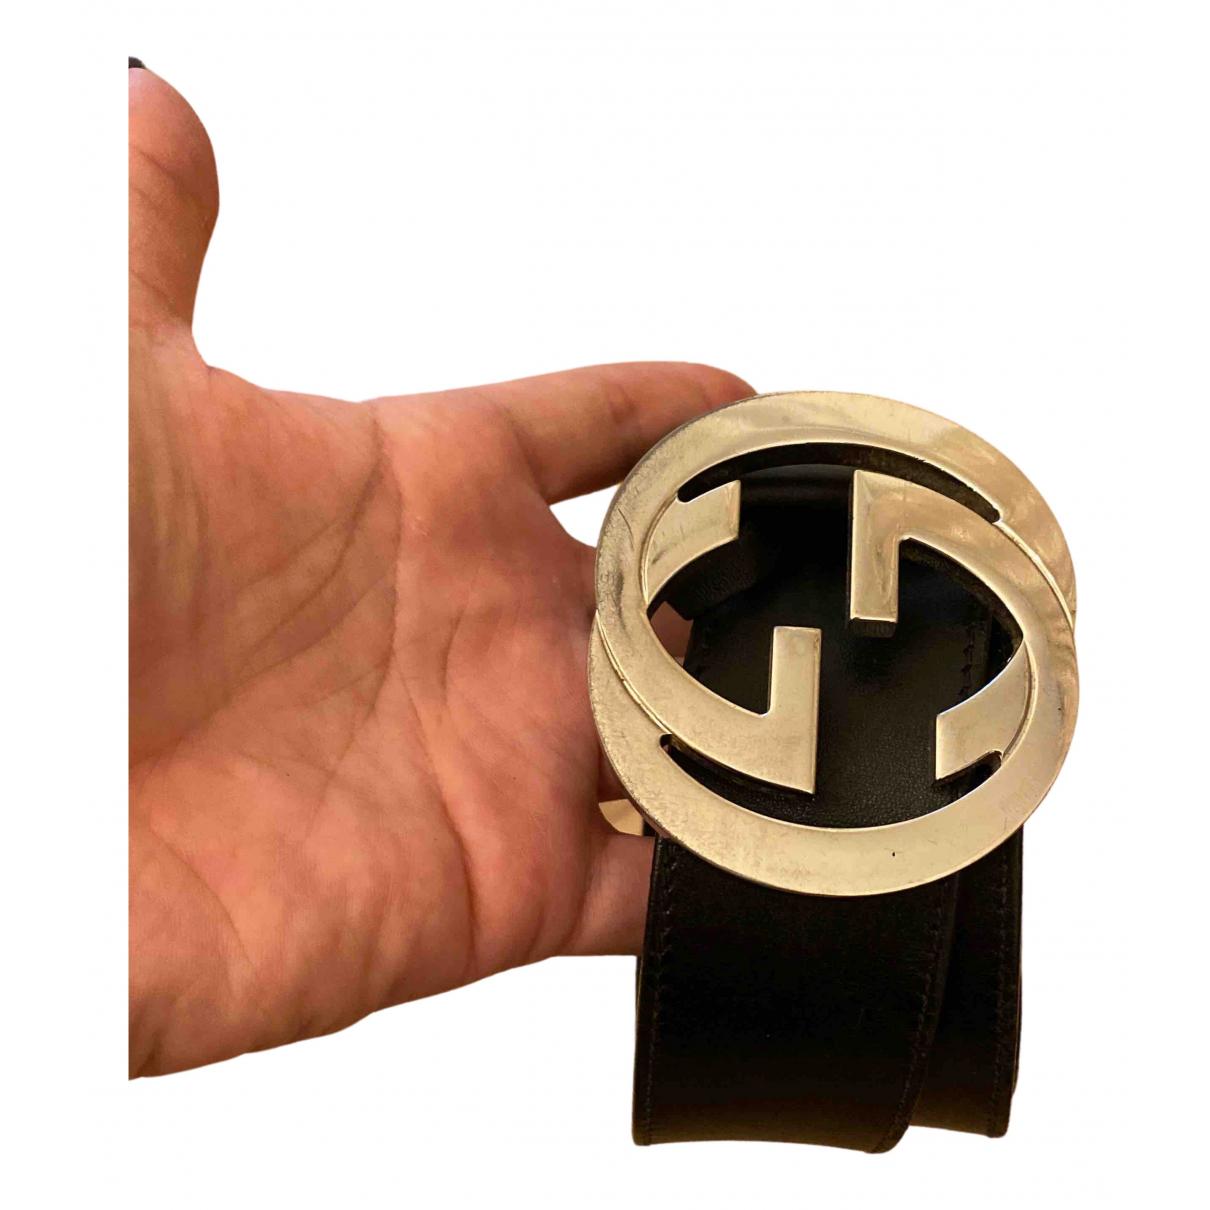 Gucci Interlocking Buckle Black Leather belt for Men 90 cm